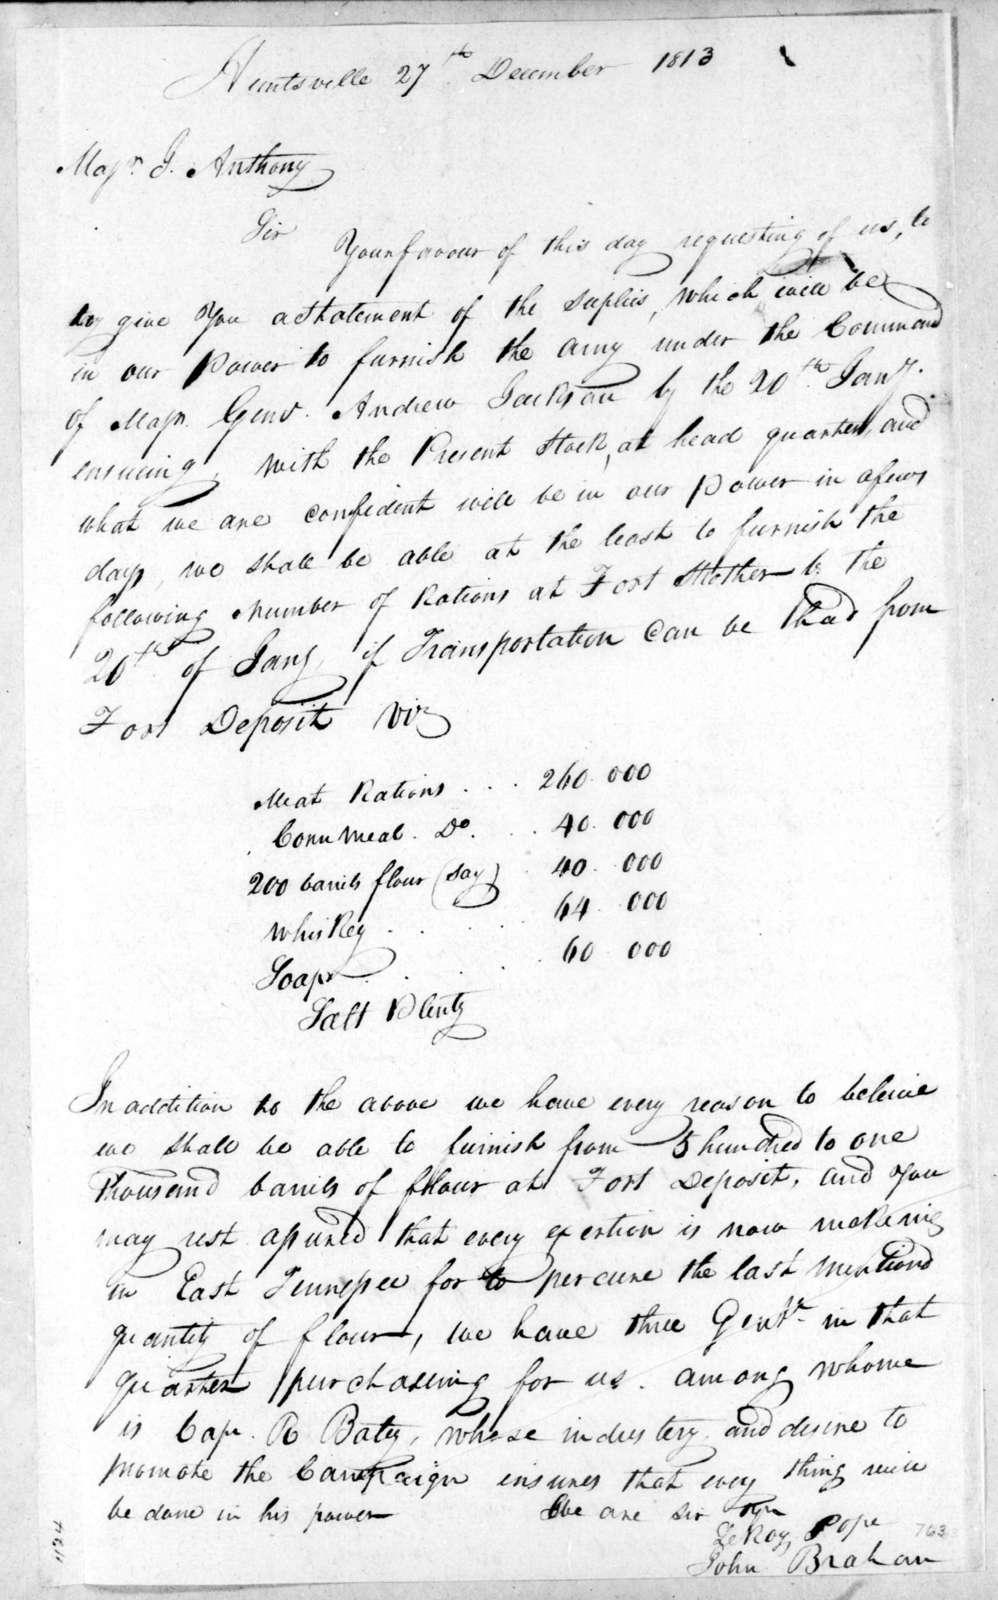 Leroy Pope & John Brahan to Joseph Anthony, December 27, 1813